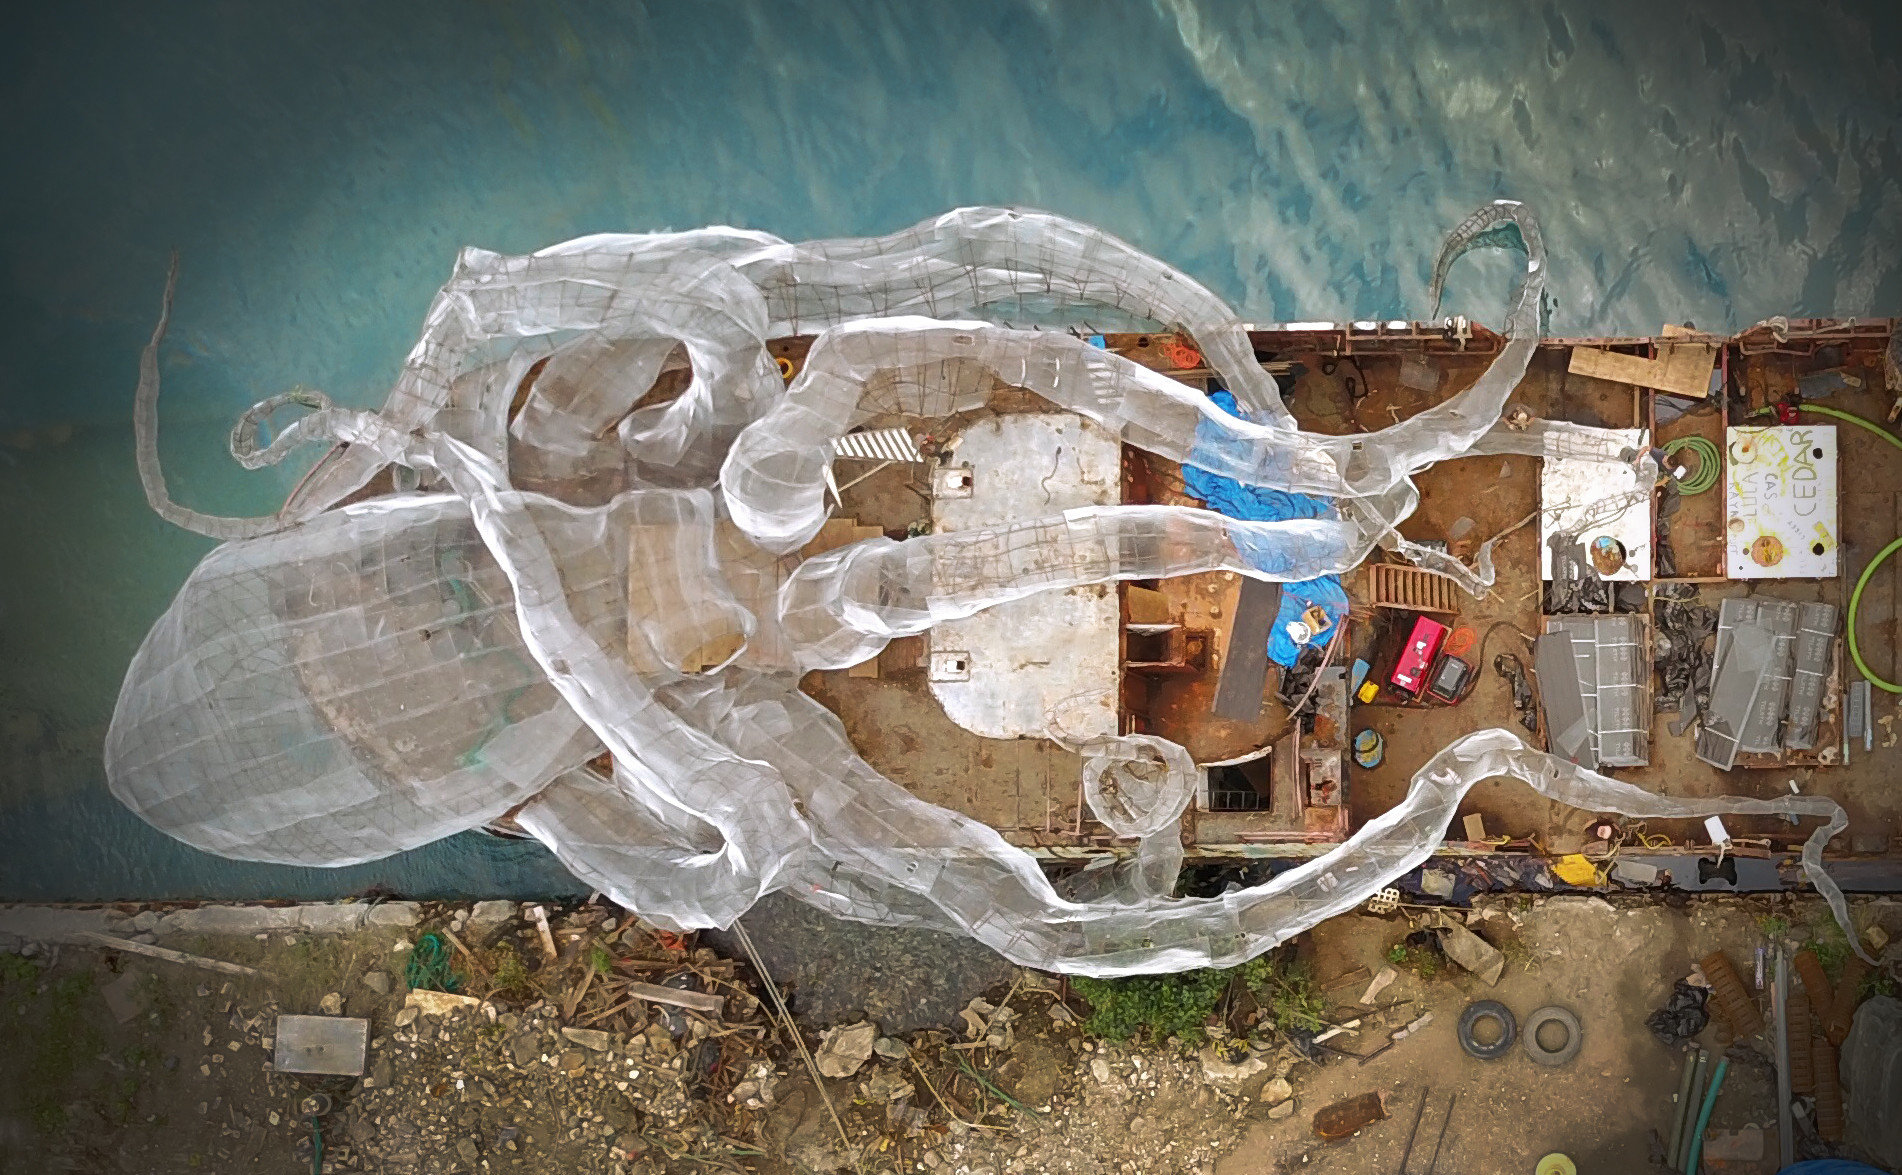 Trip Ideas broken old art water dirty trash